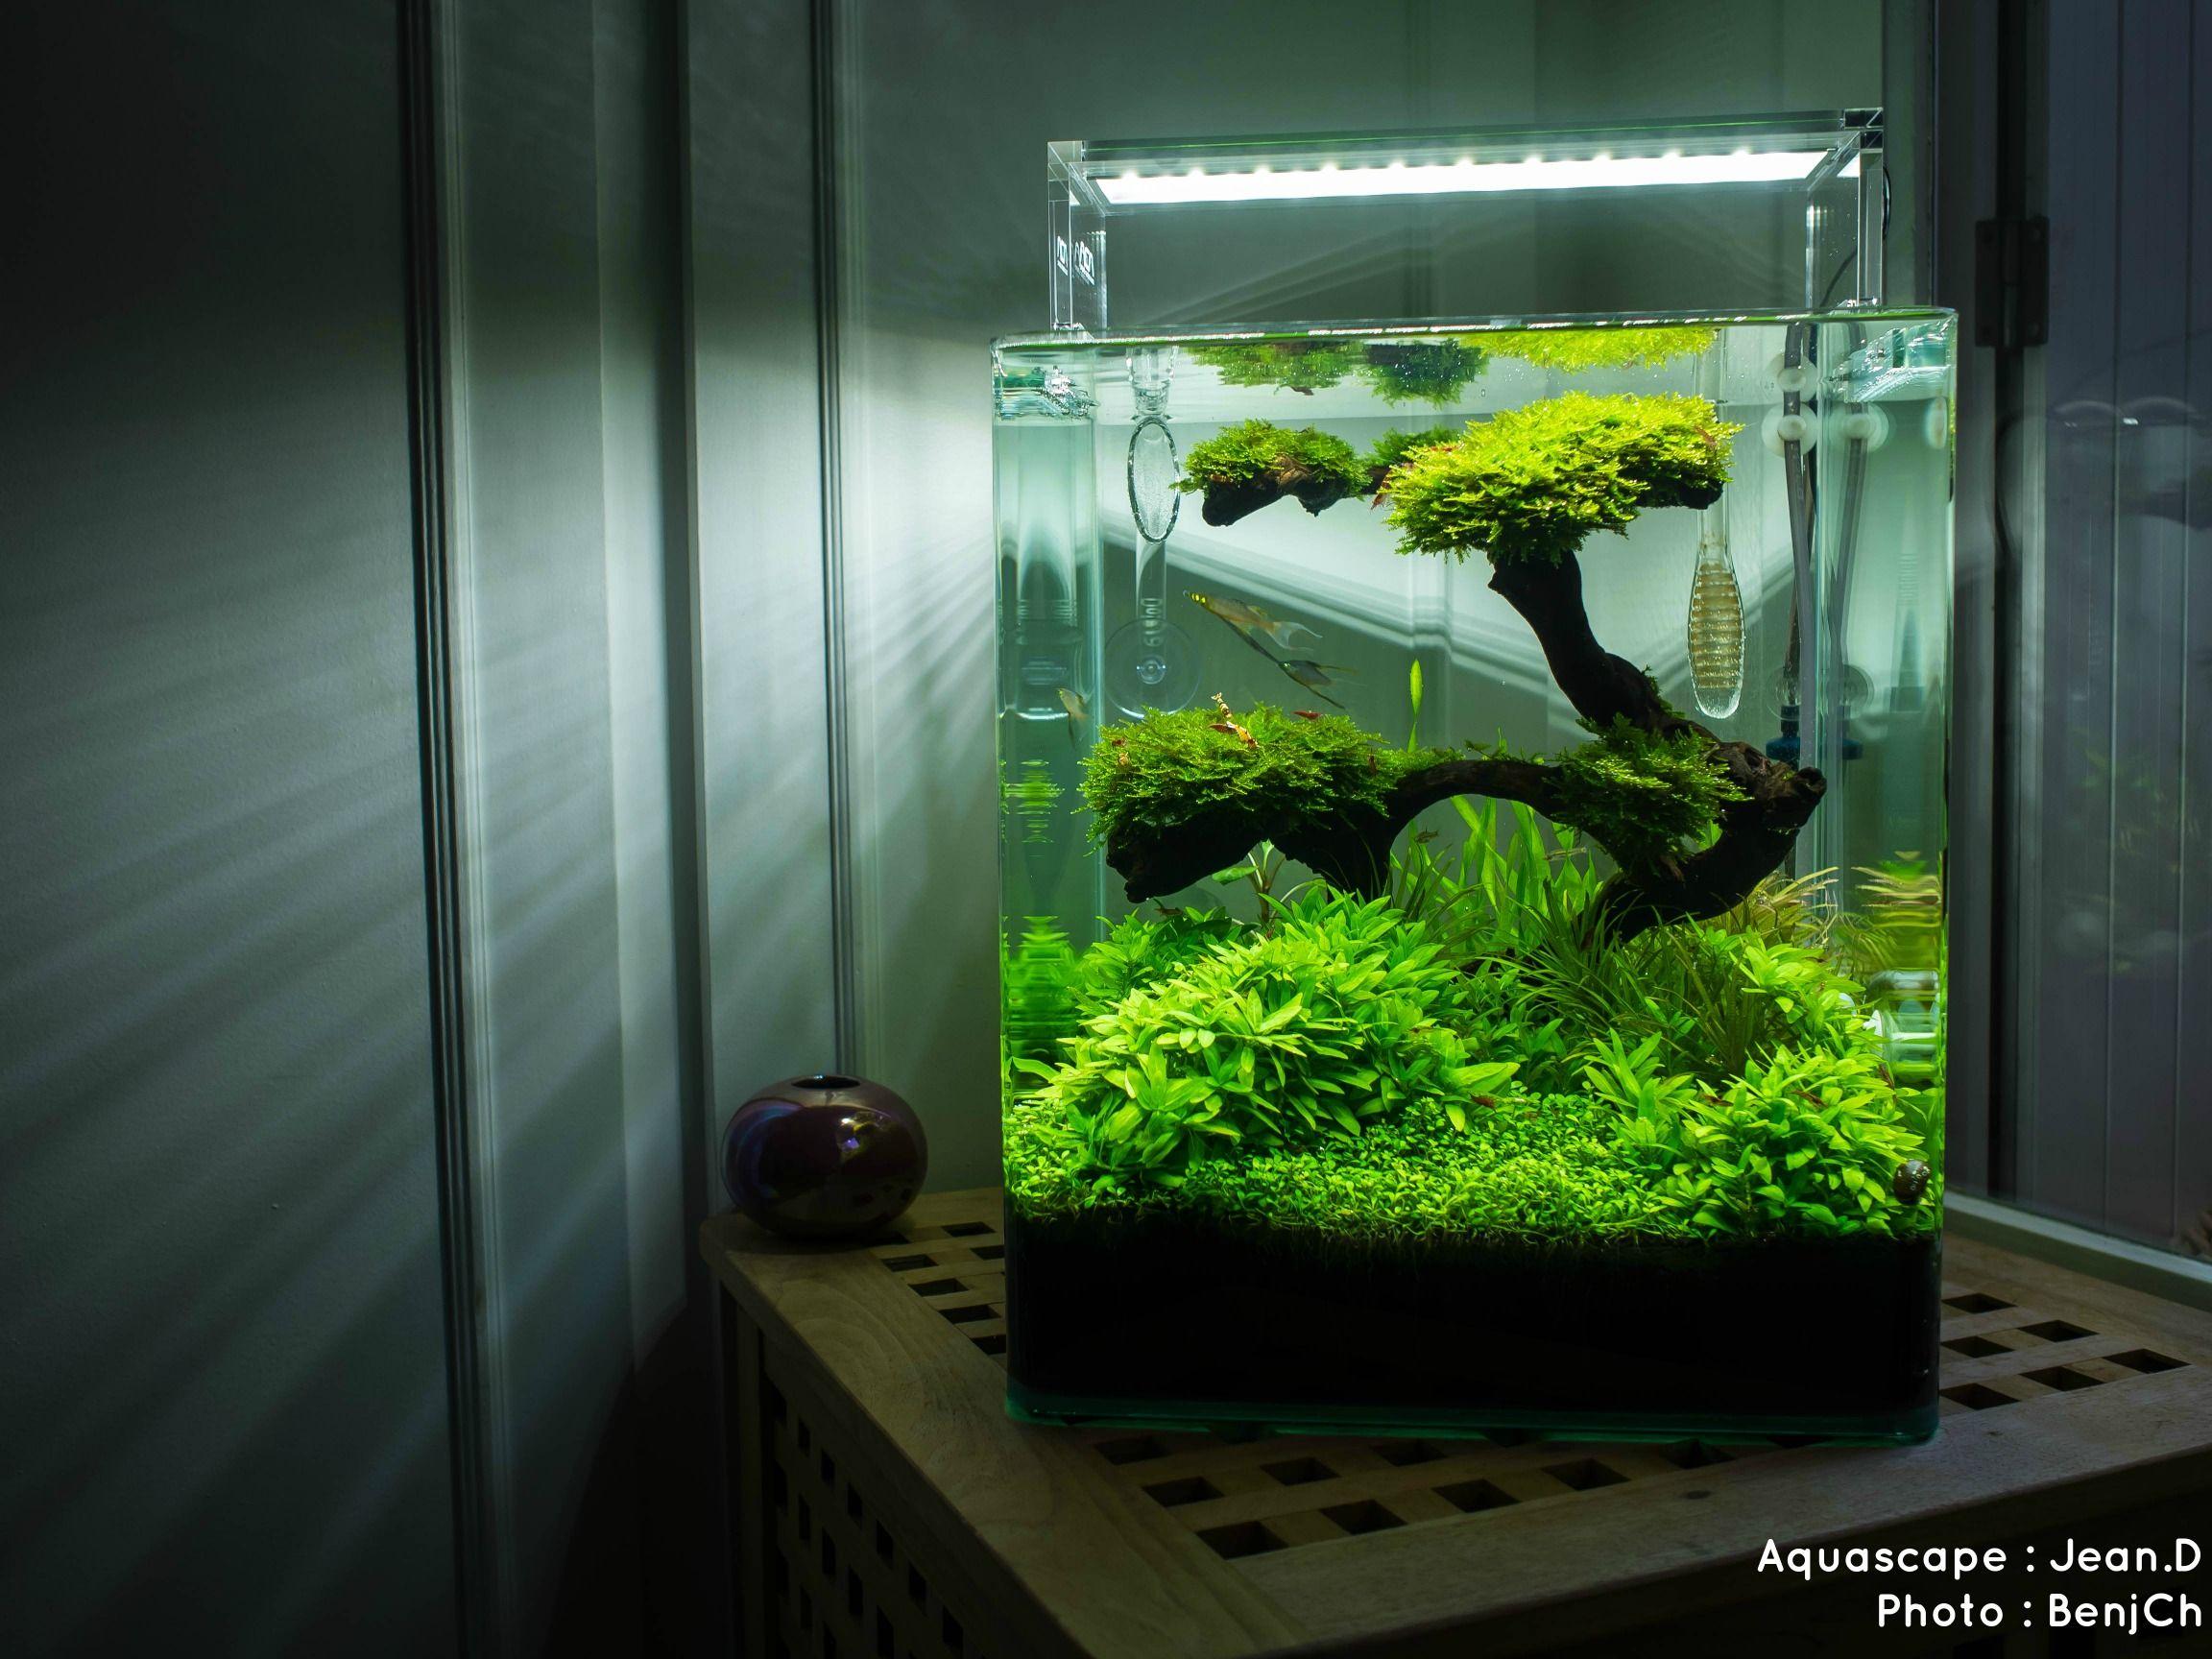 aquariums d 39 eau douce aquarium cube pinterest aquarium aquarium poisson et sous verre. Black Bedroom Furniture Sets. Home Design Ideas